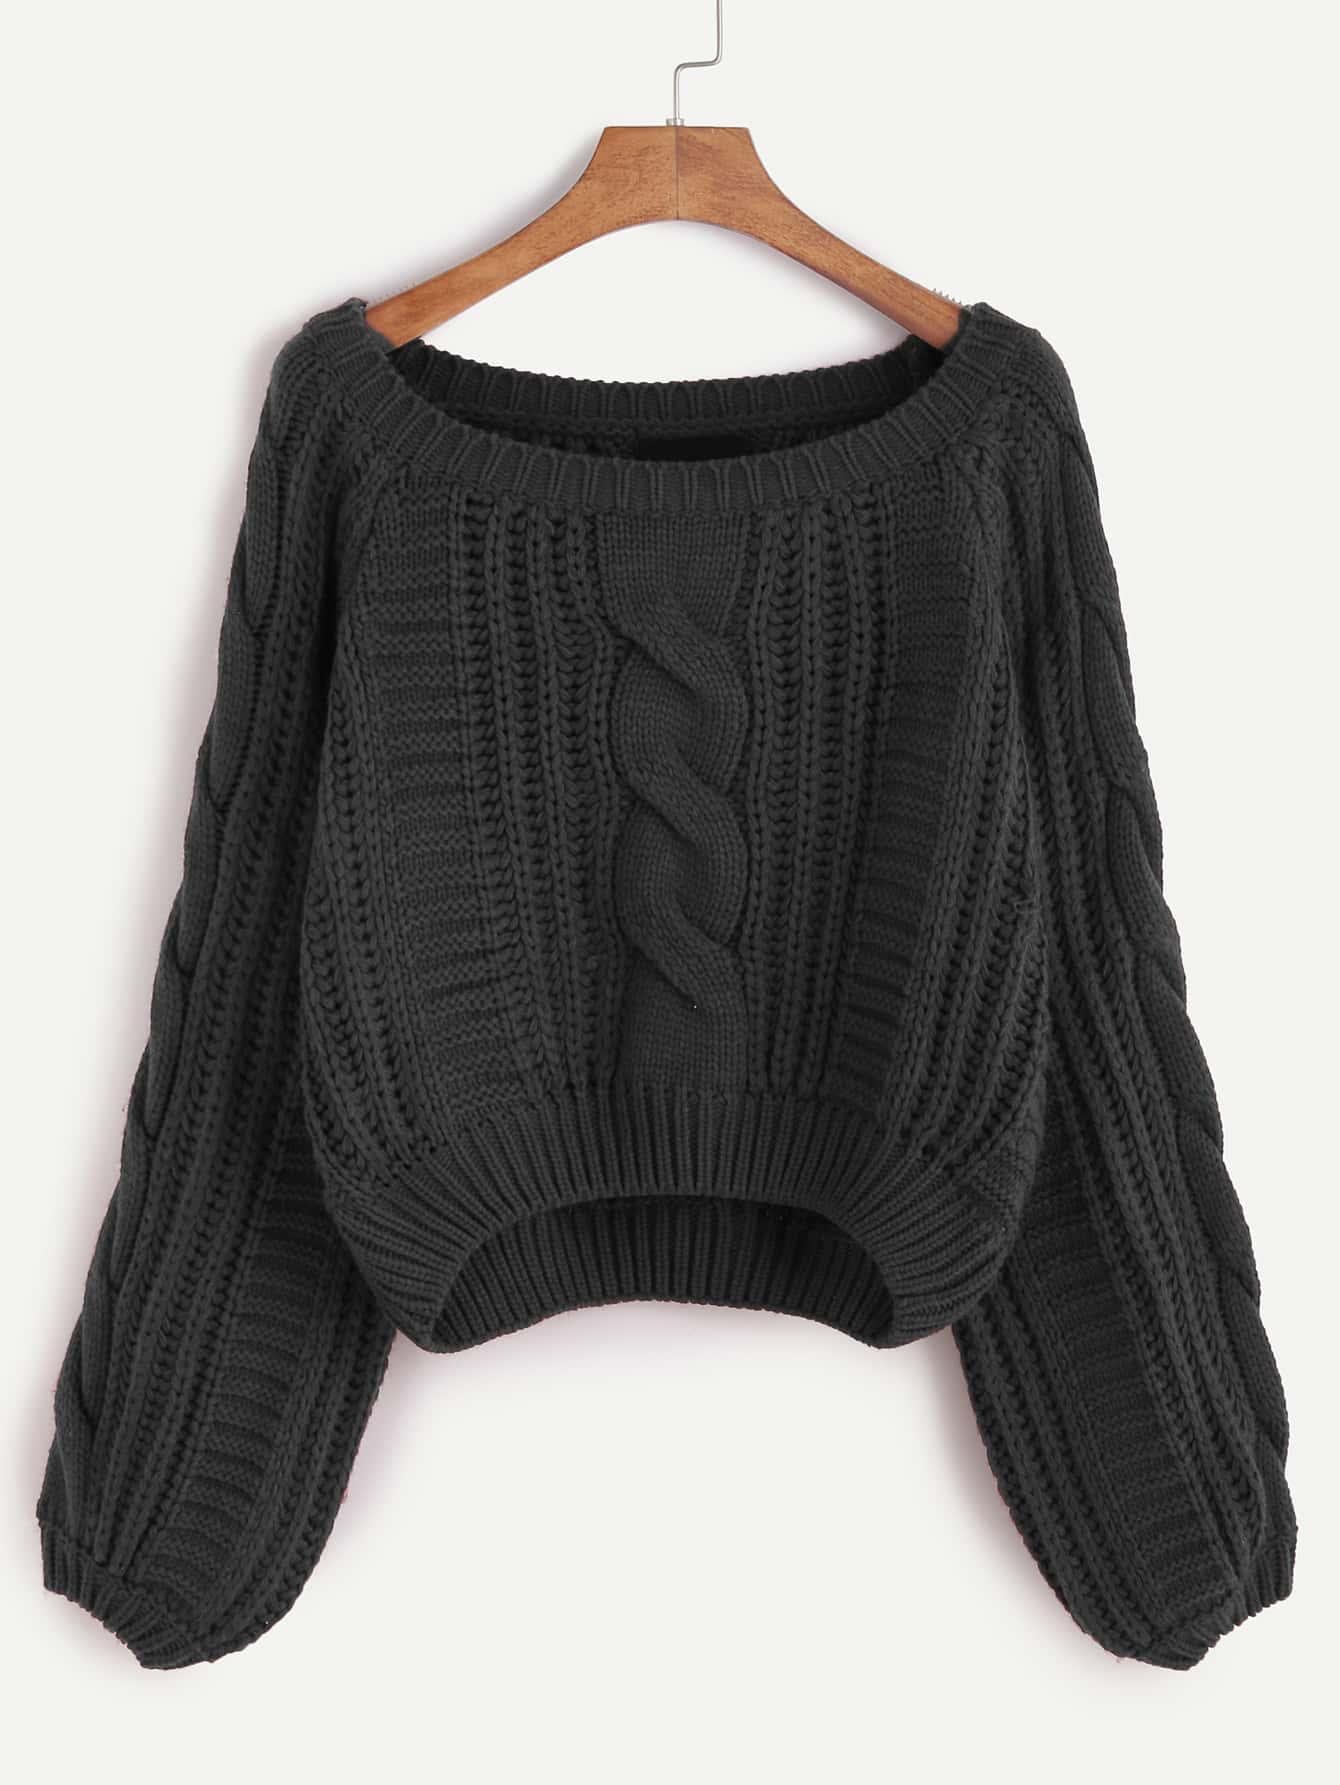 Black Raglan Sleeve Cable Knit Sweater sweater161121011